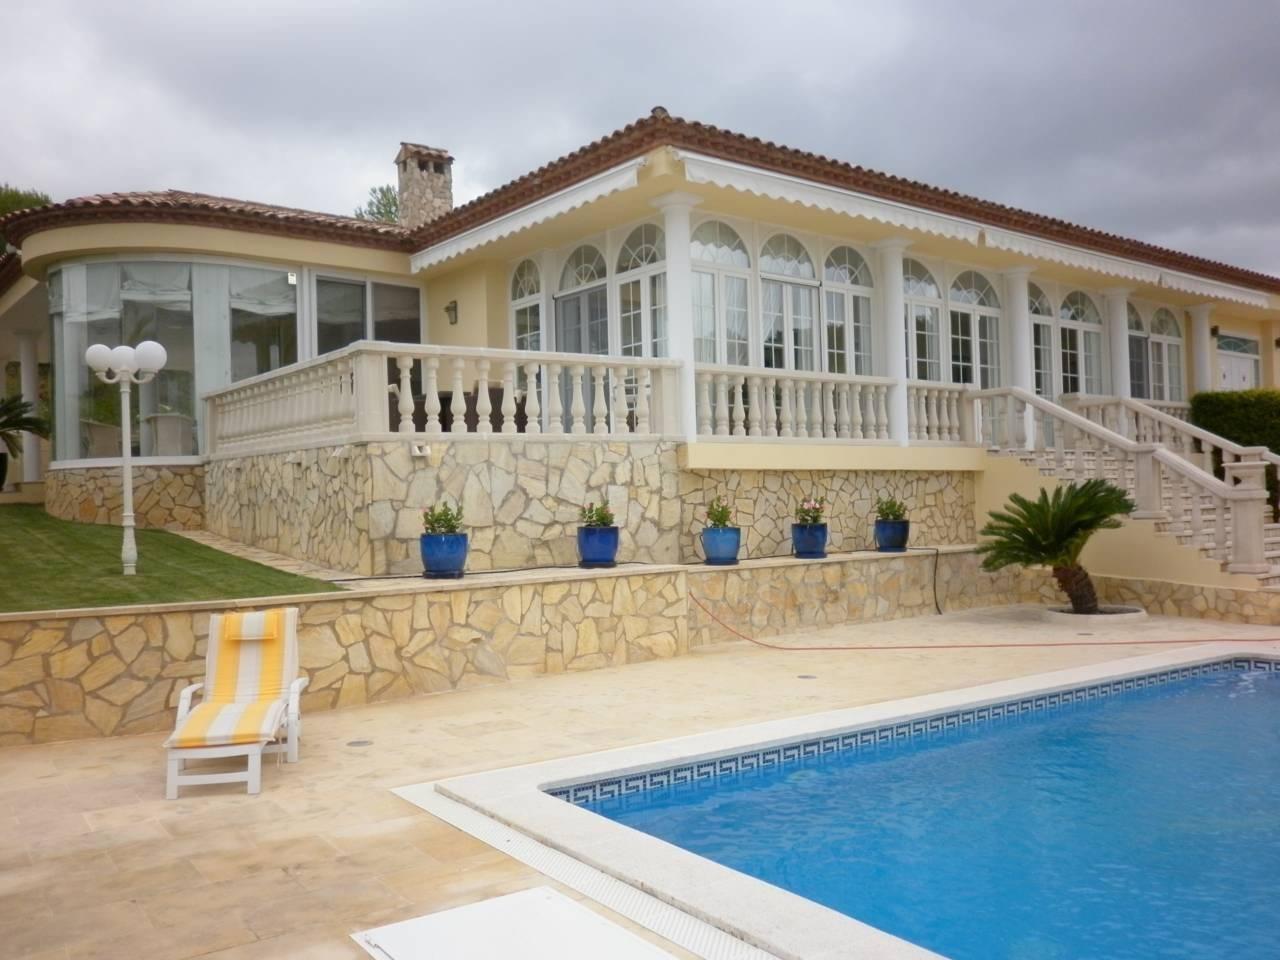 Casa  Salomó. Superf. 280 m², 1200 m² solar,  3 habitaciones ( 1 suite,  2 dob